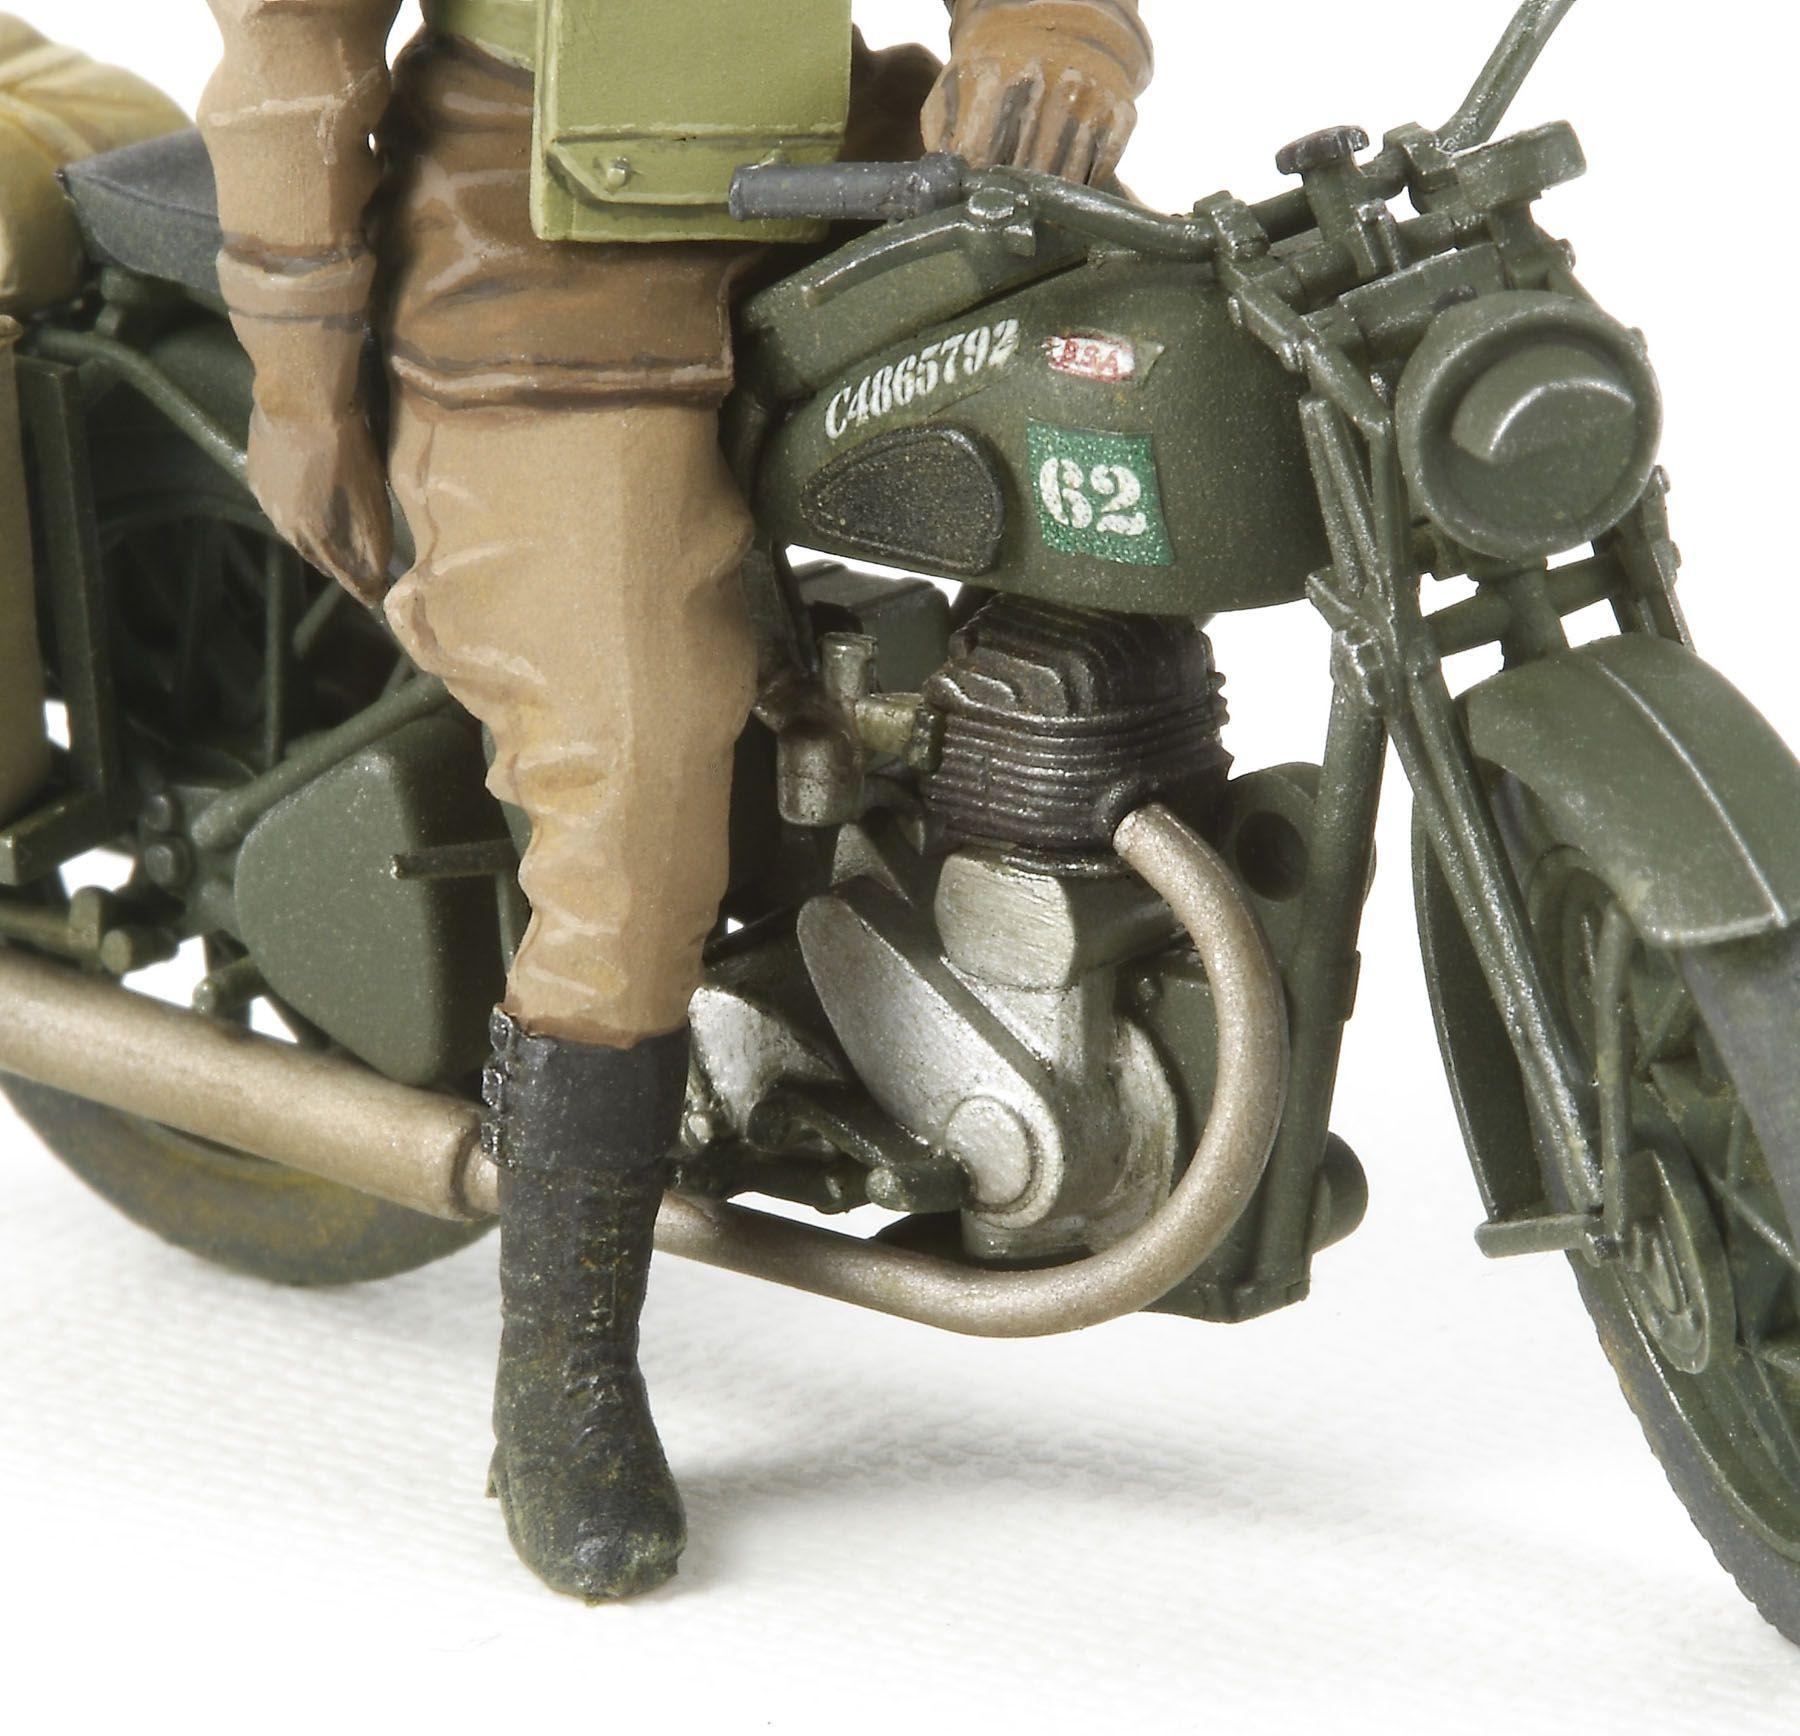 British BSA M20 Motorcycle with Military Police set - 1/35 - Tamiya 35316  - BLIMPS COMÉRCIO ELETRÔNICO